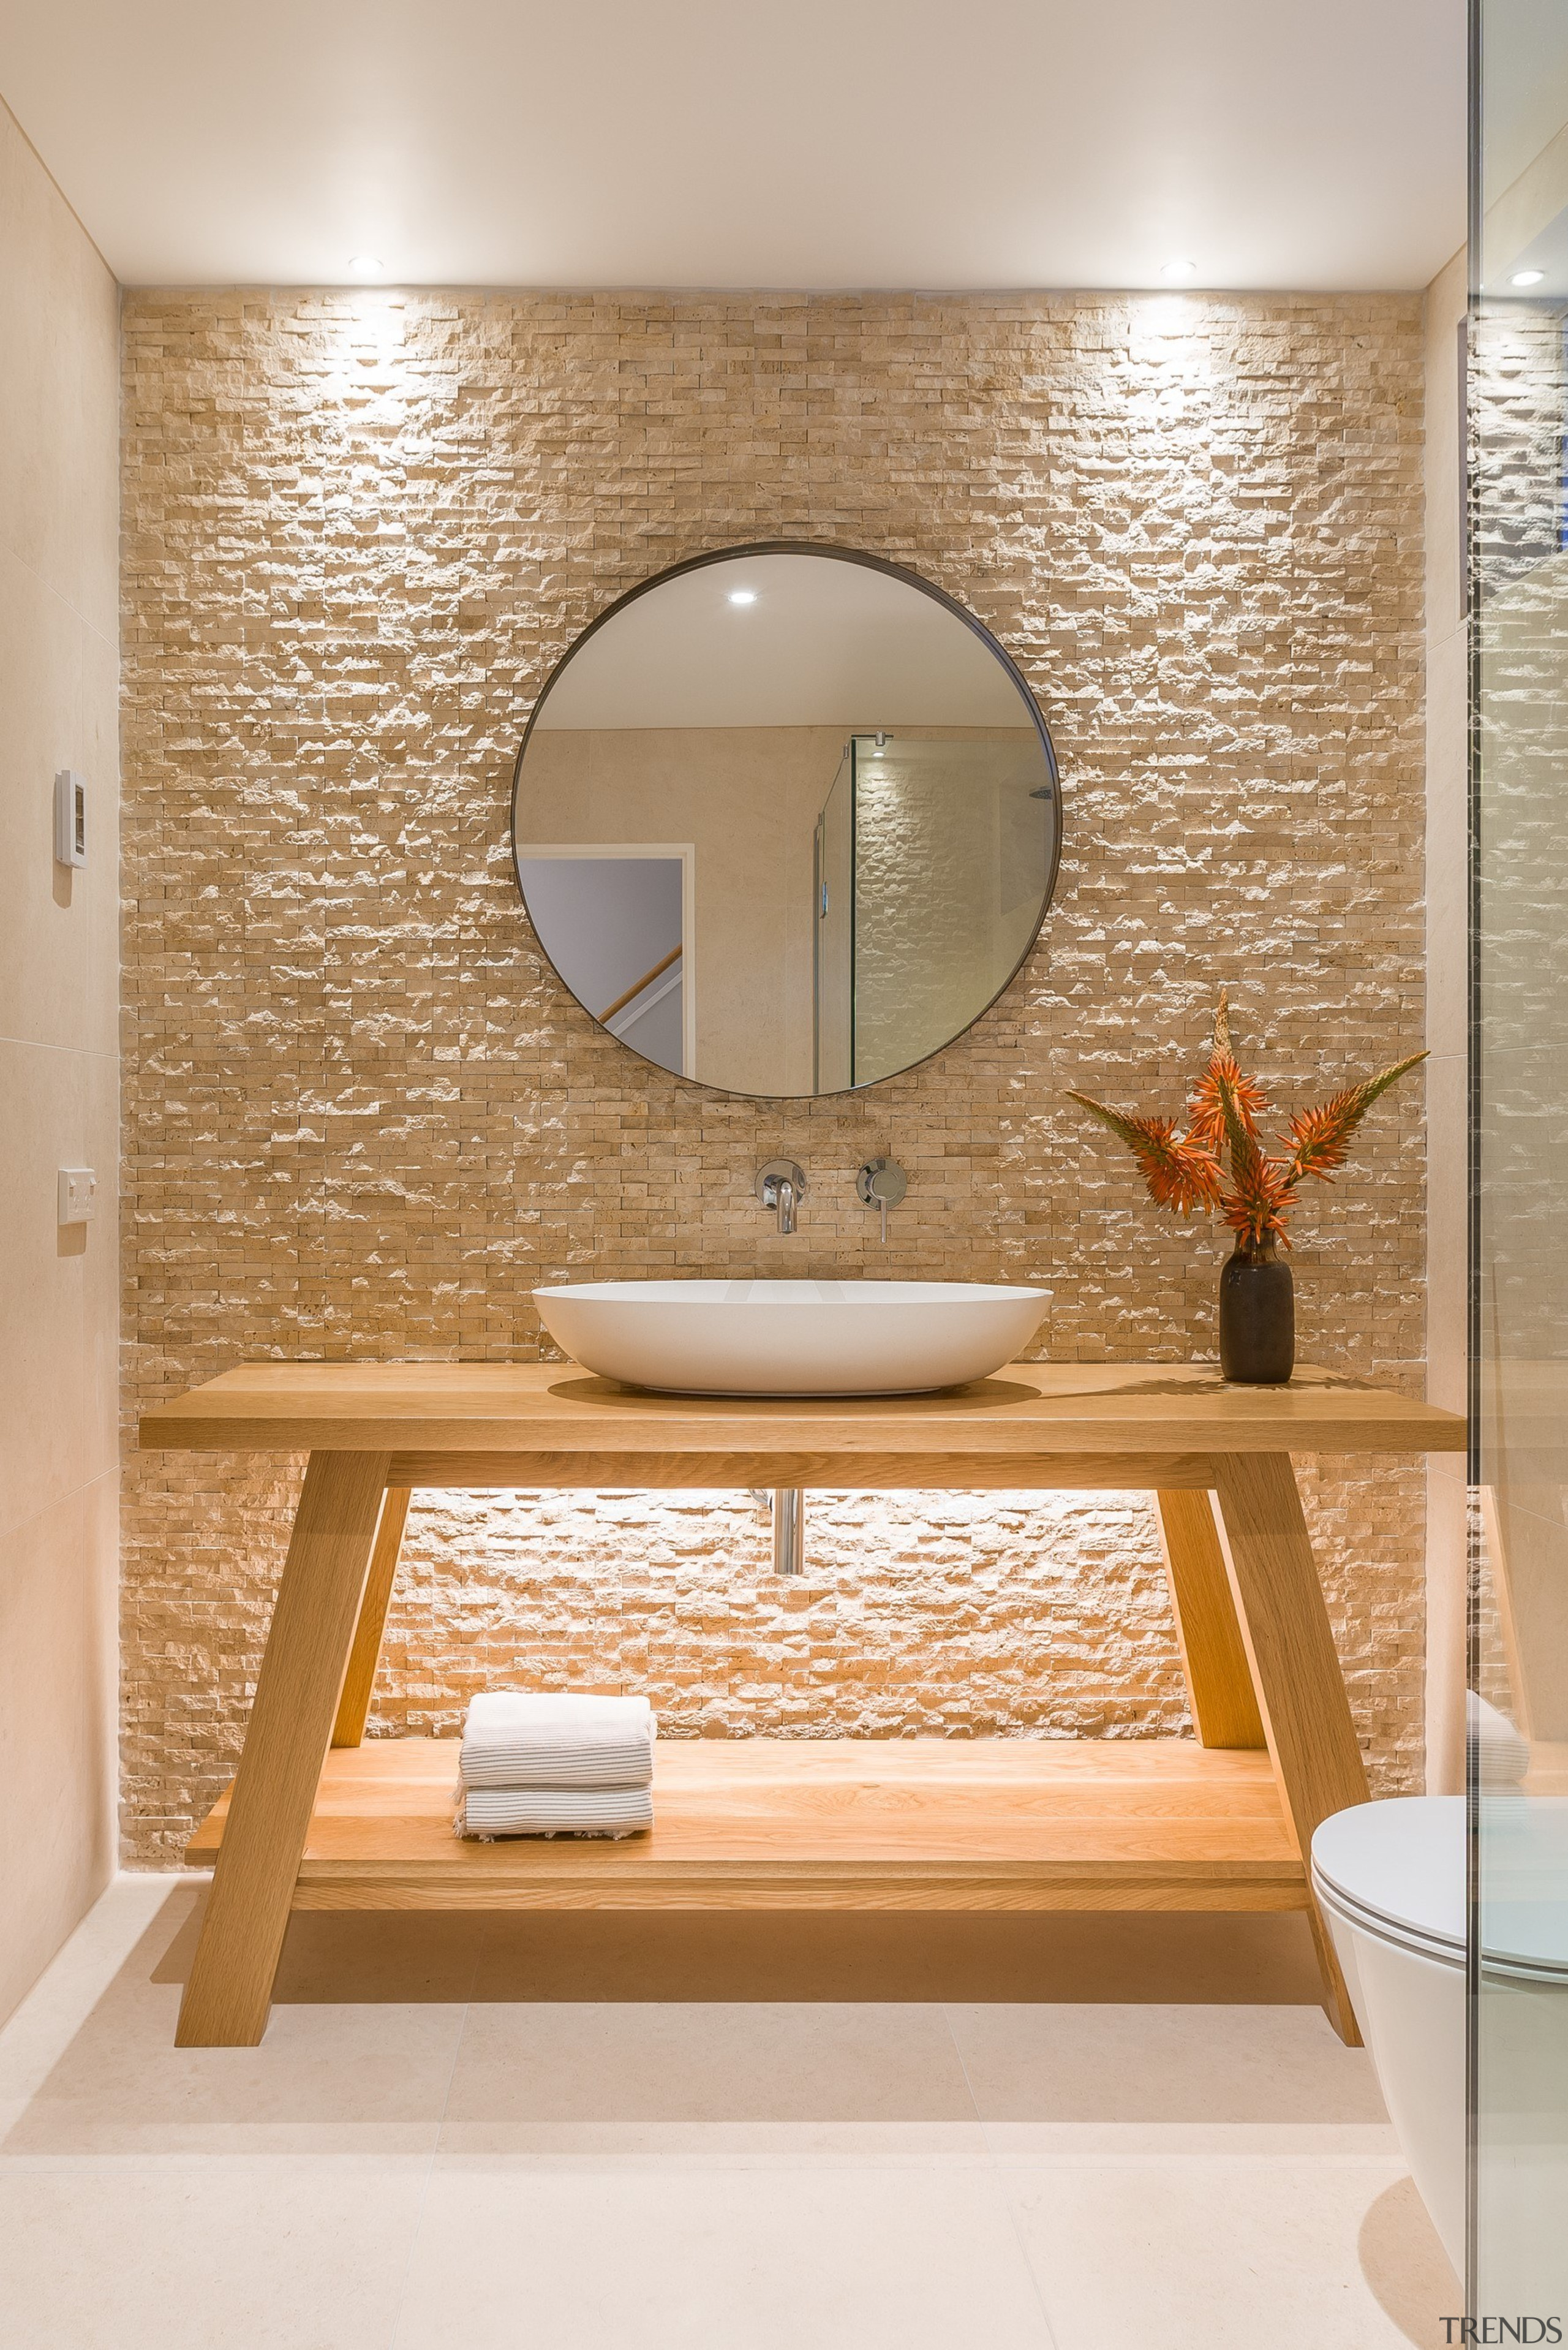 圆形的梳妆镜和置物架式的梳妆台,有一种简单的小资情调。 architecture, bathroom, ceiling, floor, flooring, interior design, plumbing fixture, room, sink, tap, tile, wall, gray, orange